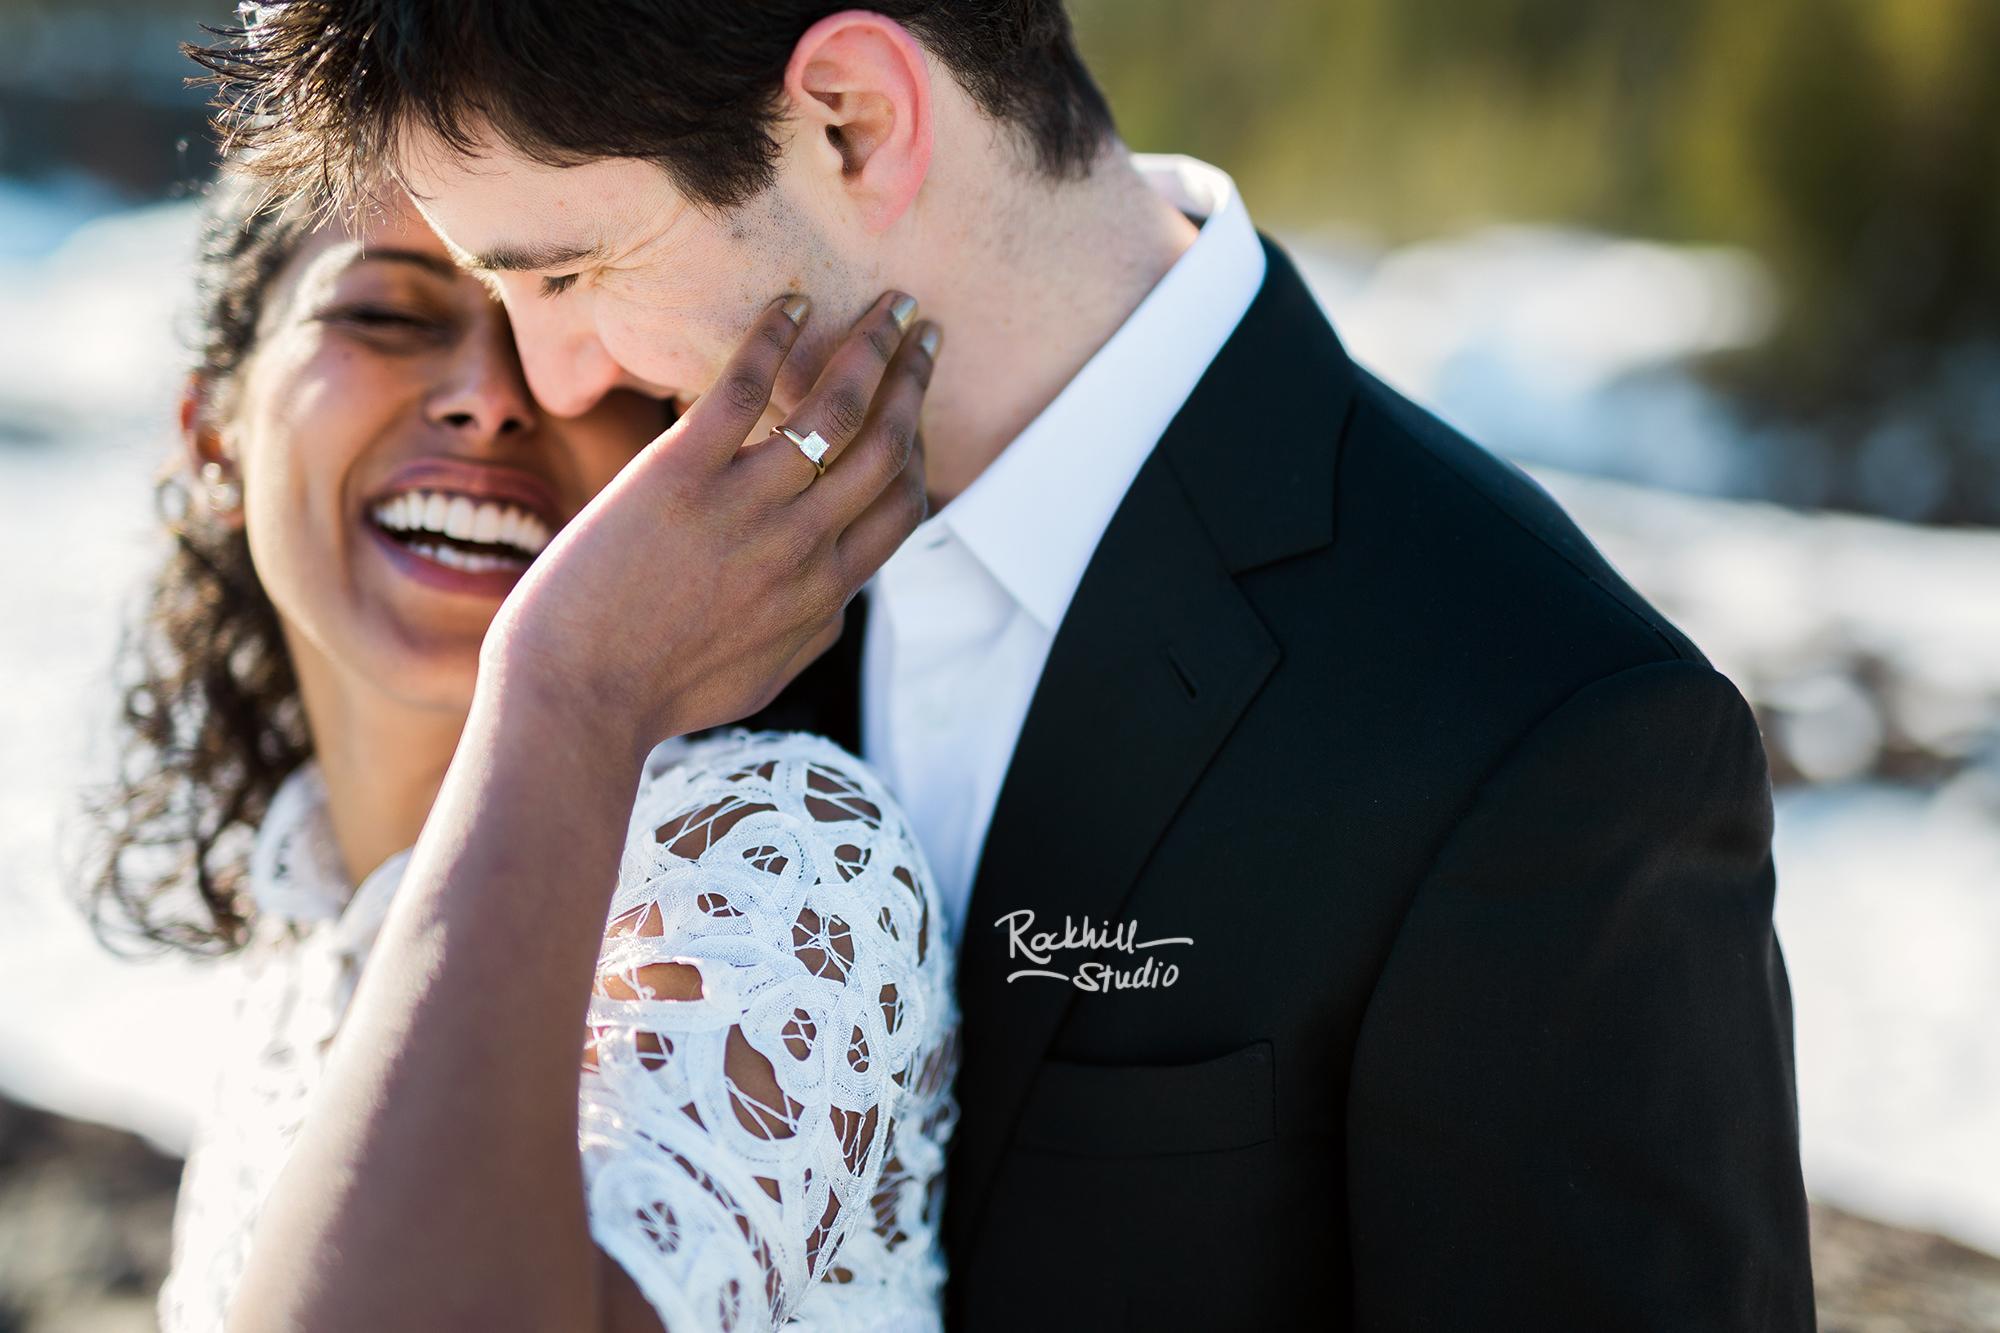 northern-michigan-wedding-marquette-engagement-upper-peninsula-michigan-rockhill-winter-8.jpg